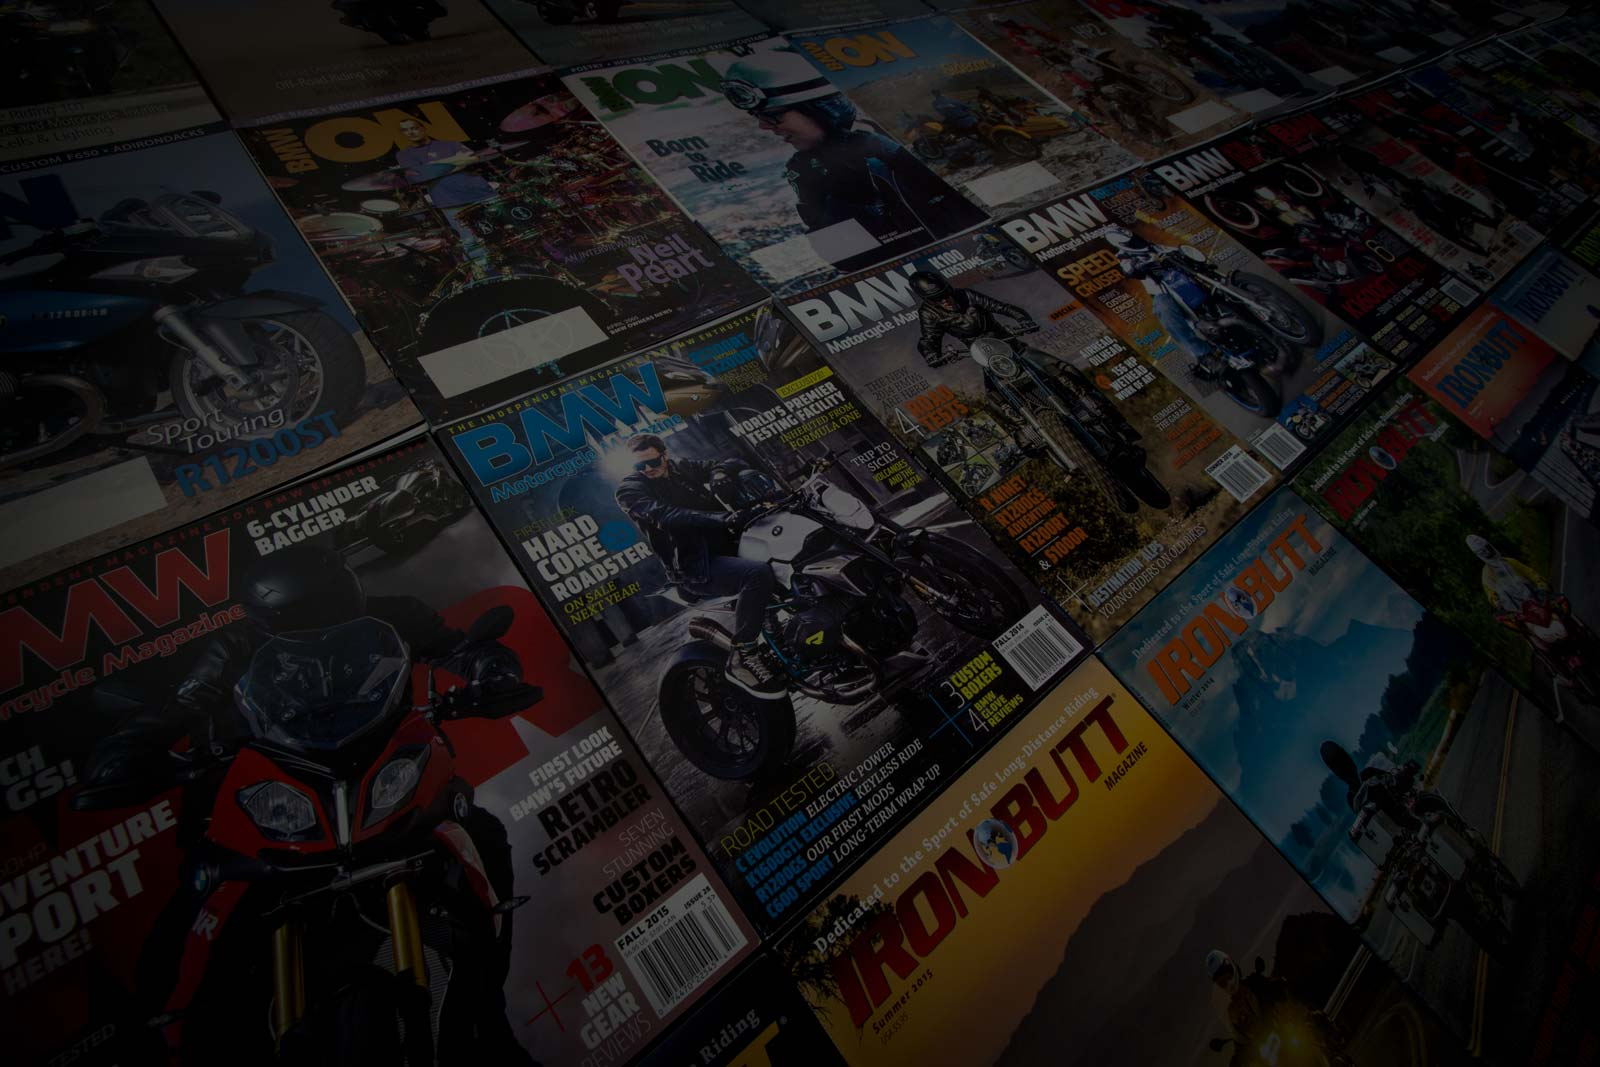 Magazine covers image